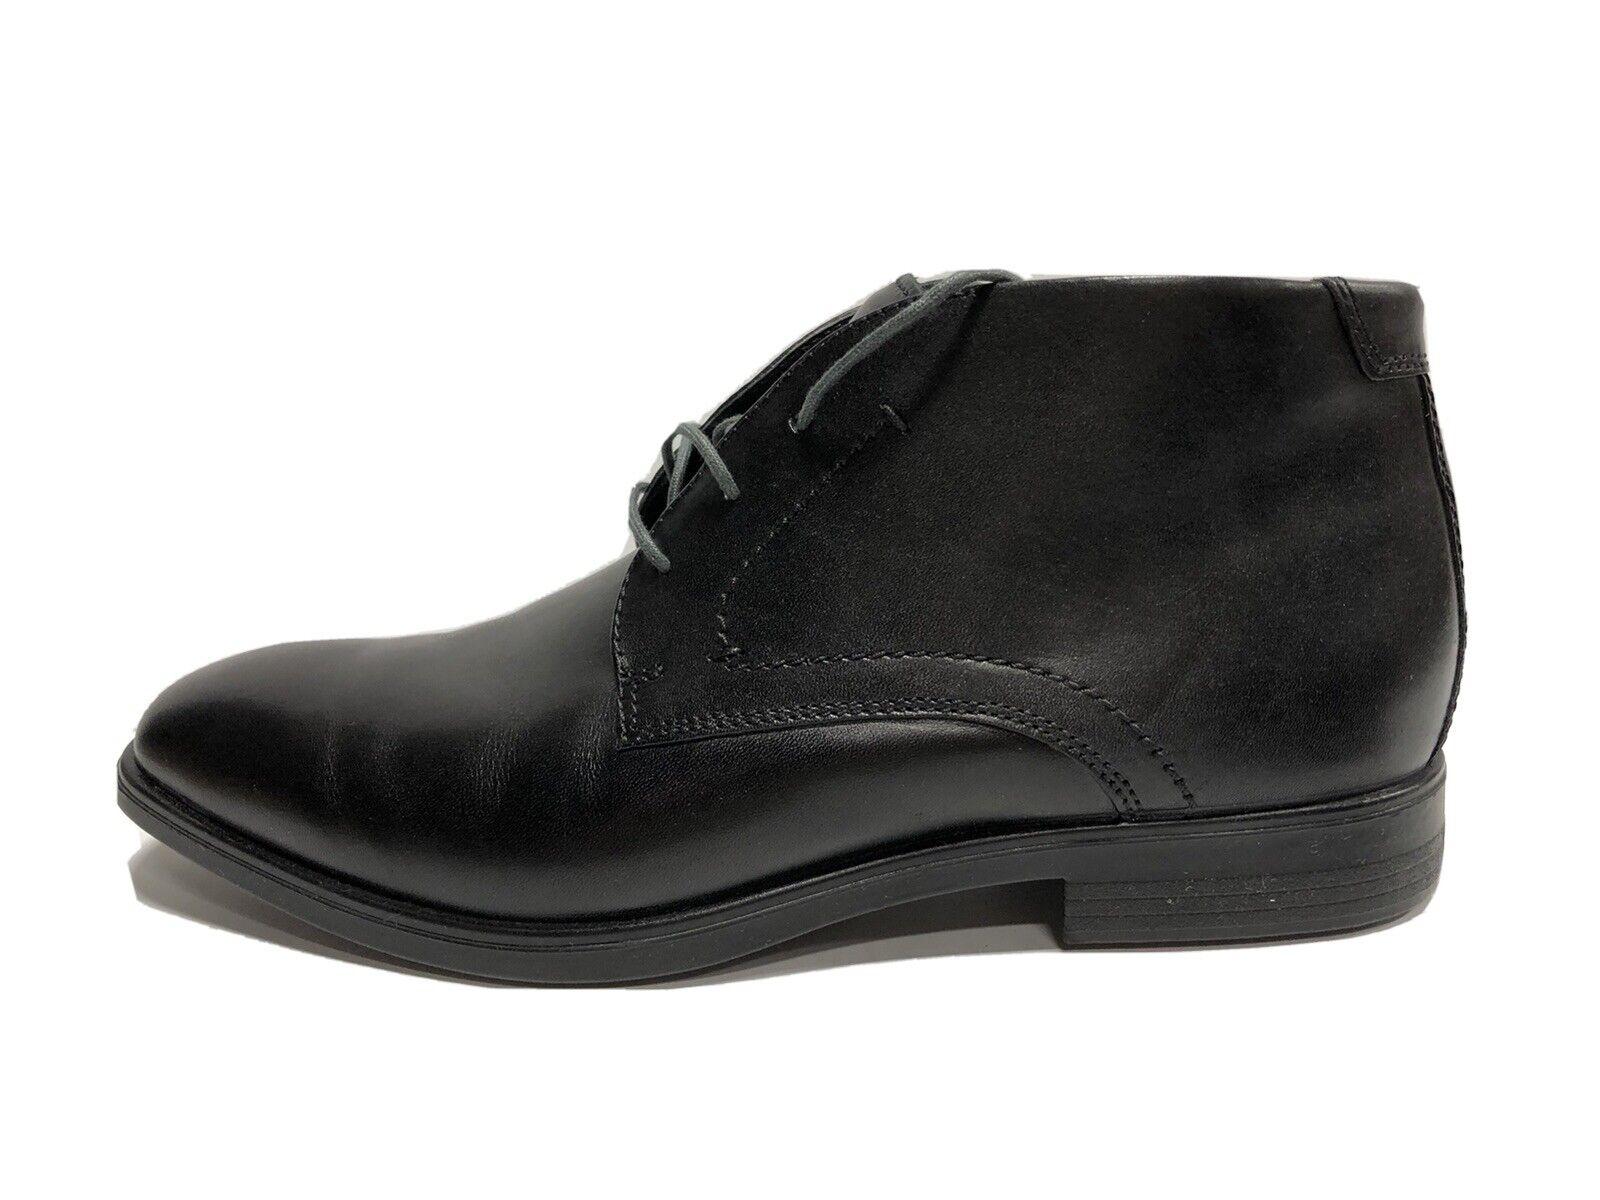 ECCO Melbourne Chukka Boot Black Leather EUR43 9-9.5 M